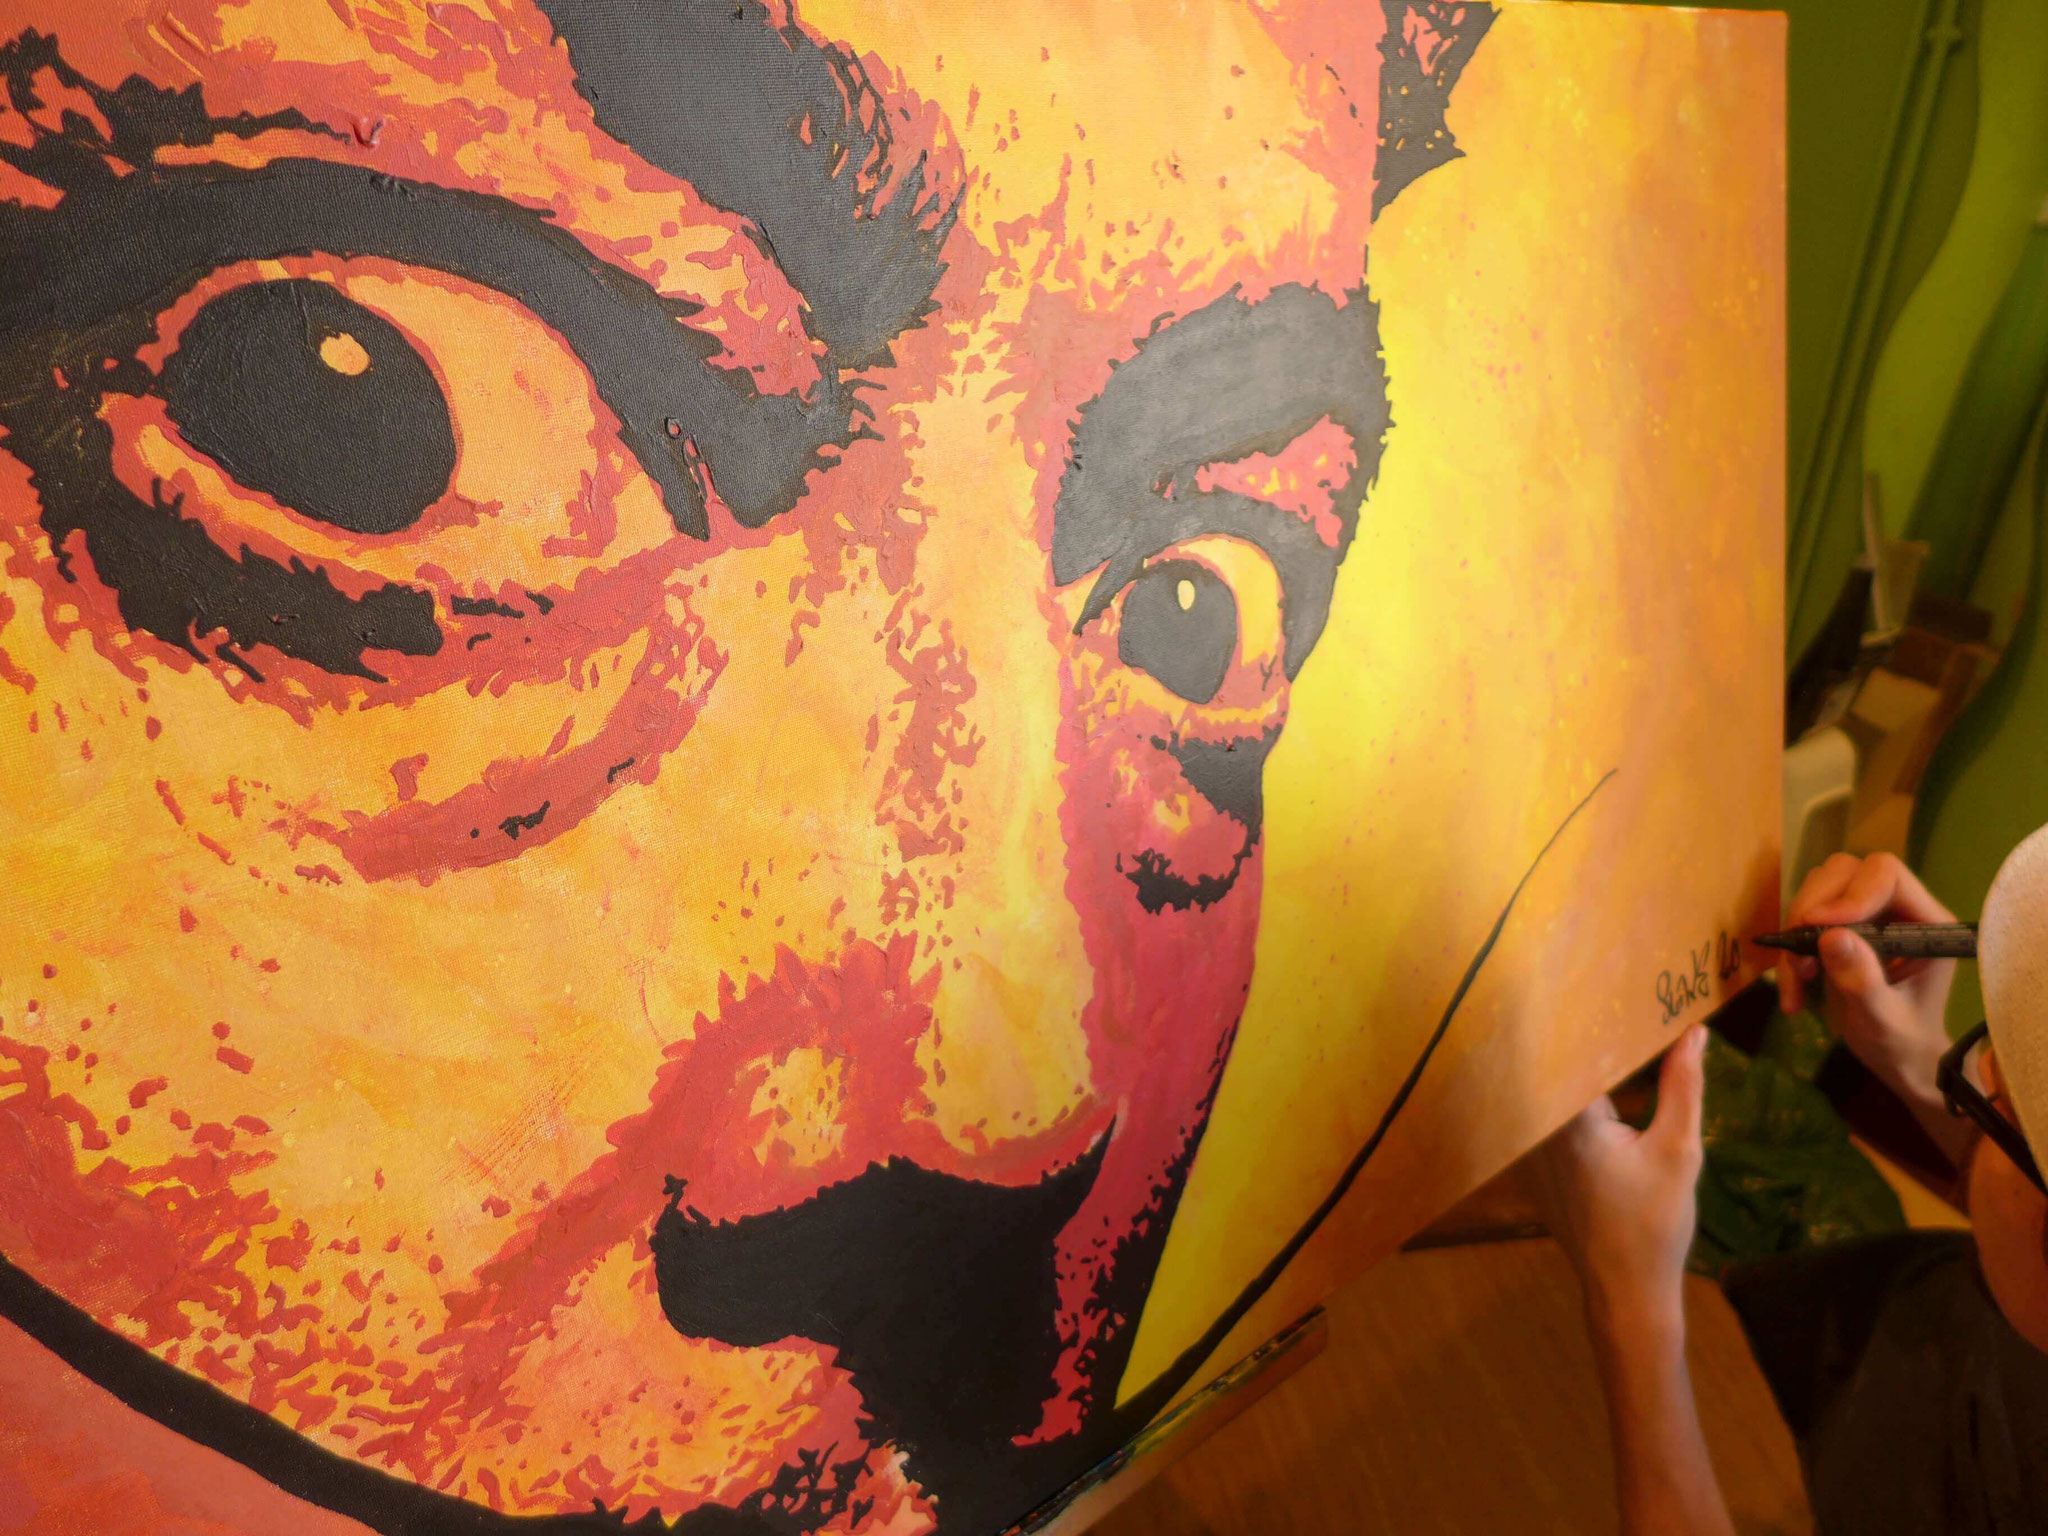 détail salvador dali peinture street art